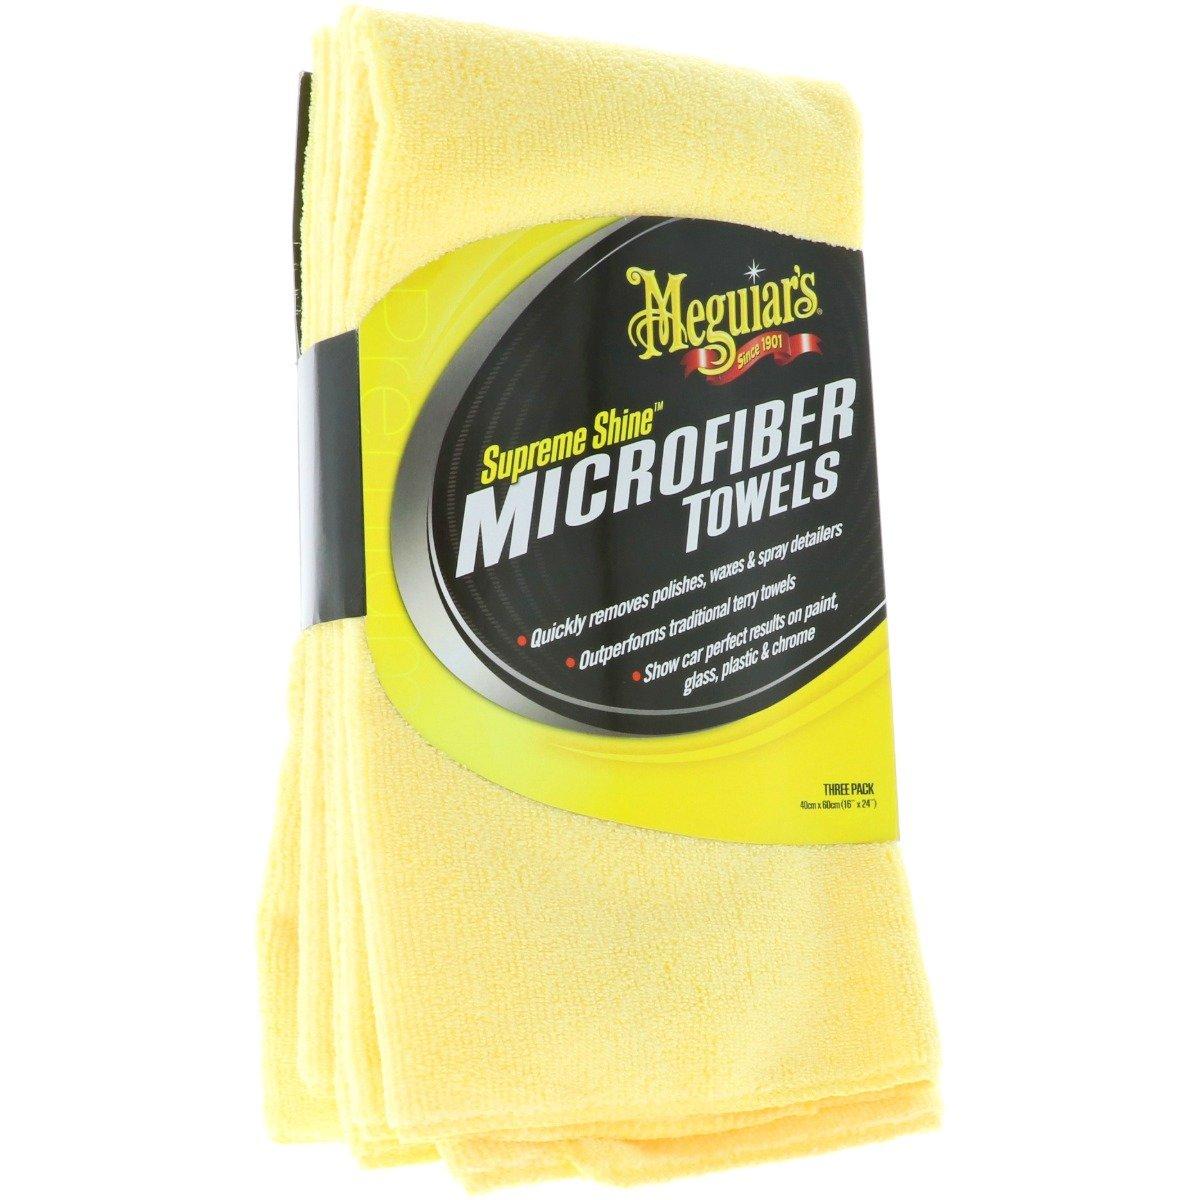 Meguiars Gold Class Supreme Shine Microfiber - 3 Pack kopen